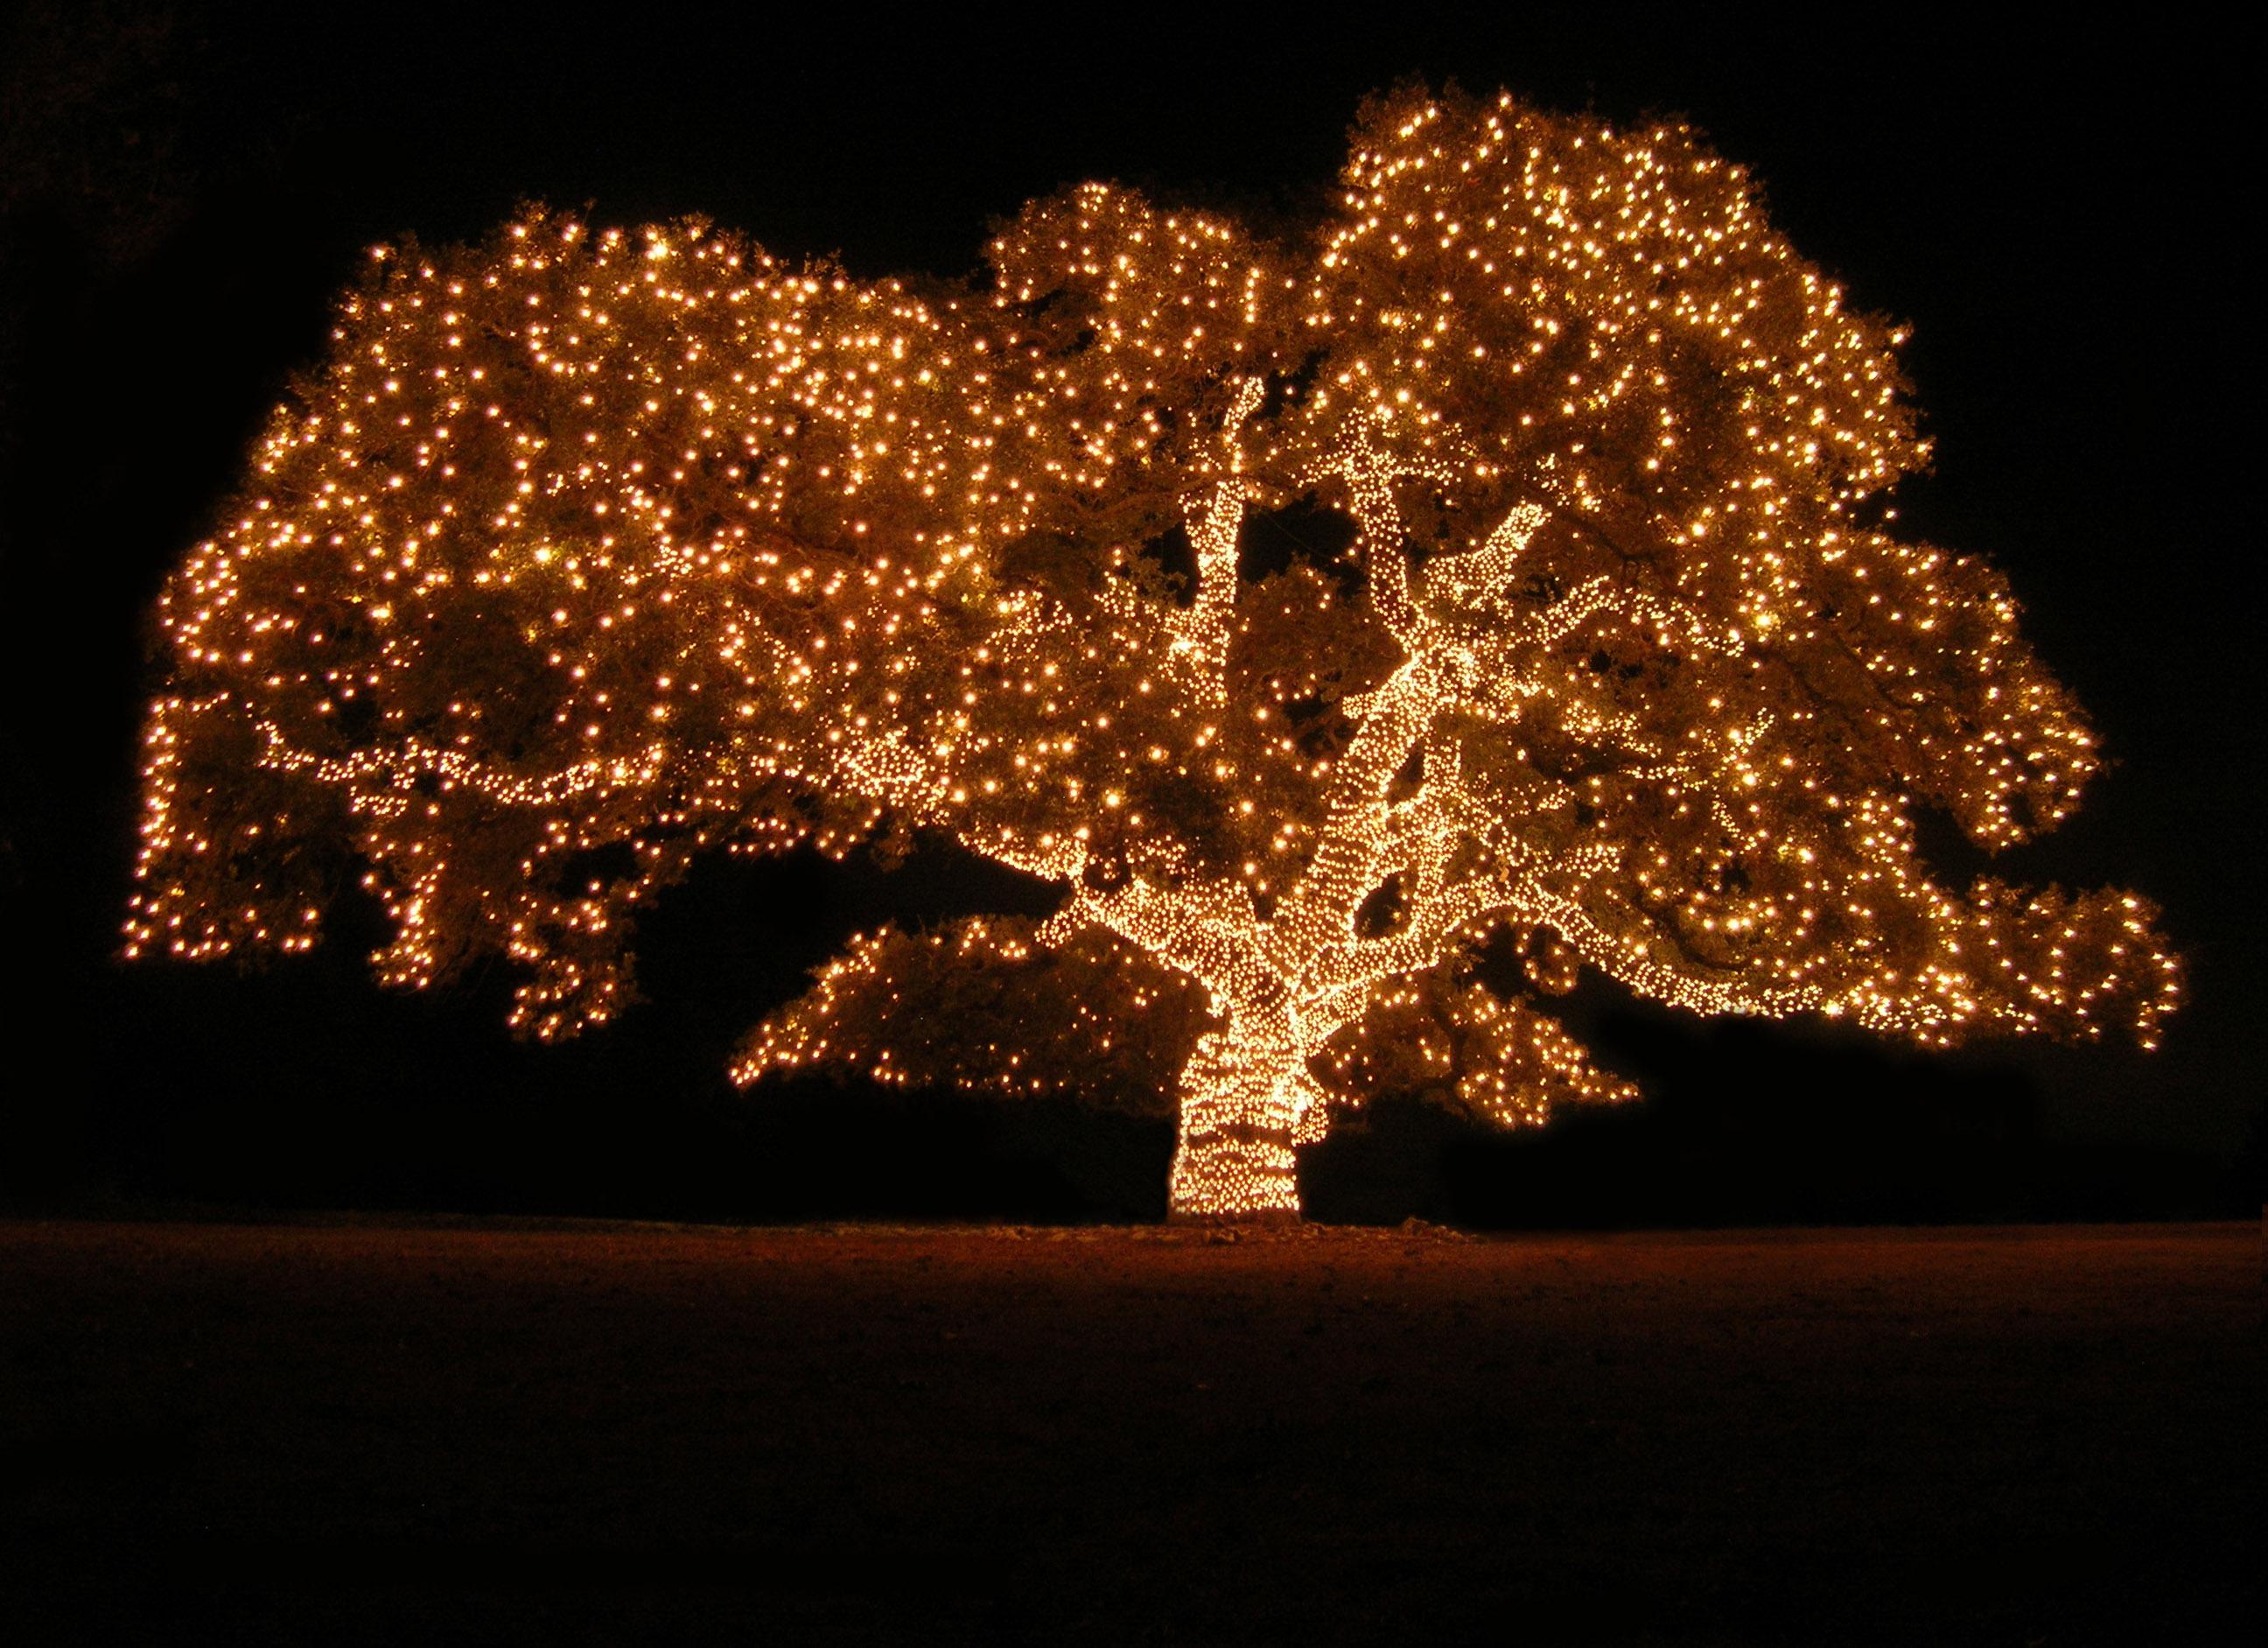 Tree lights photo